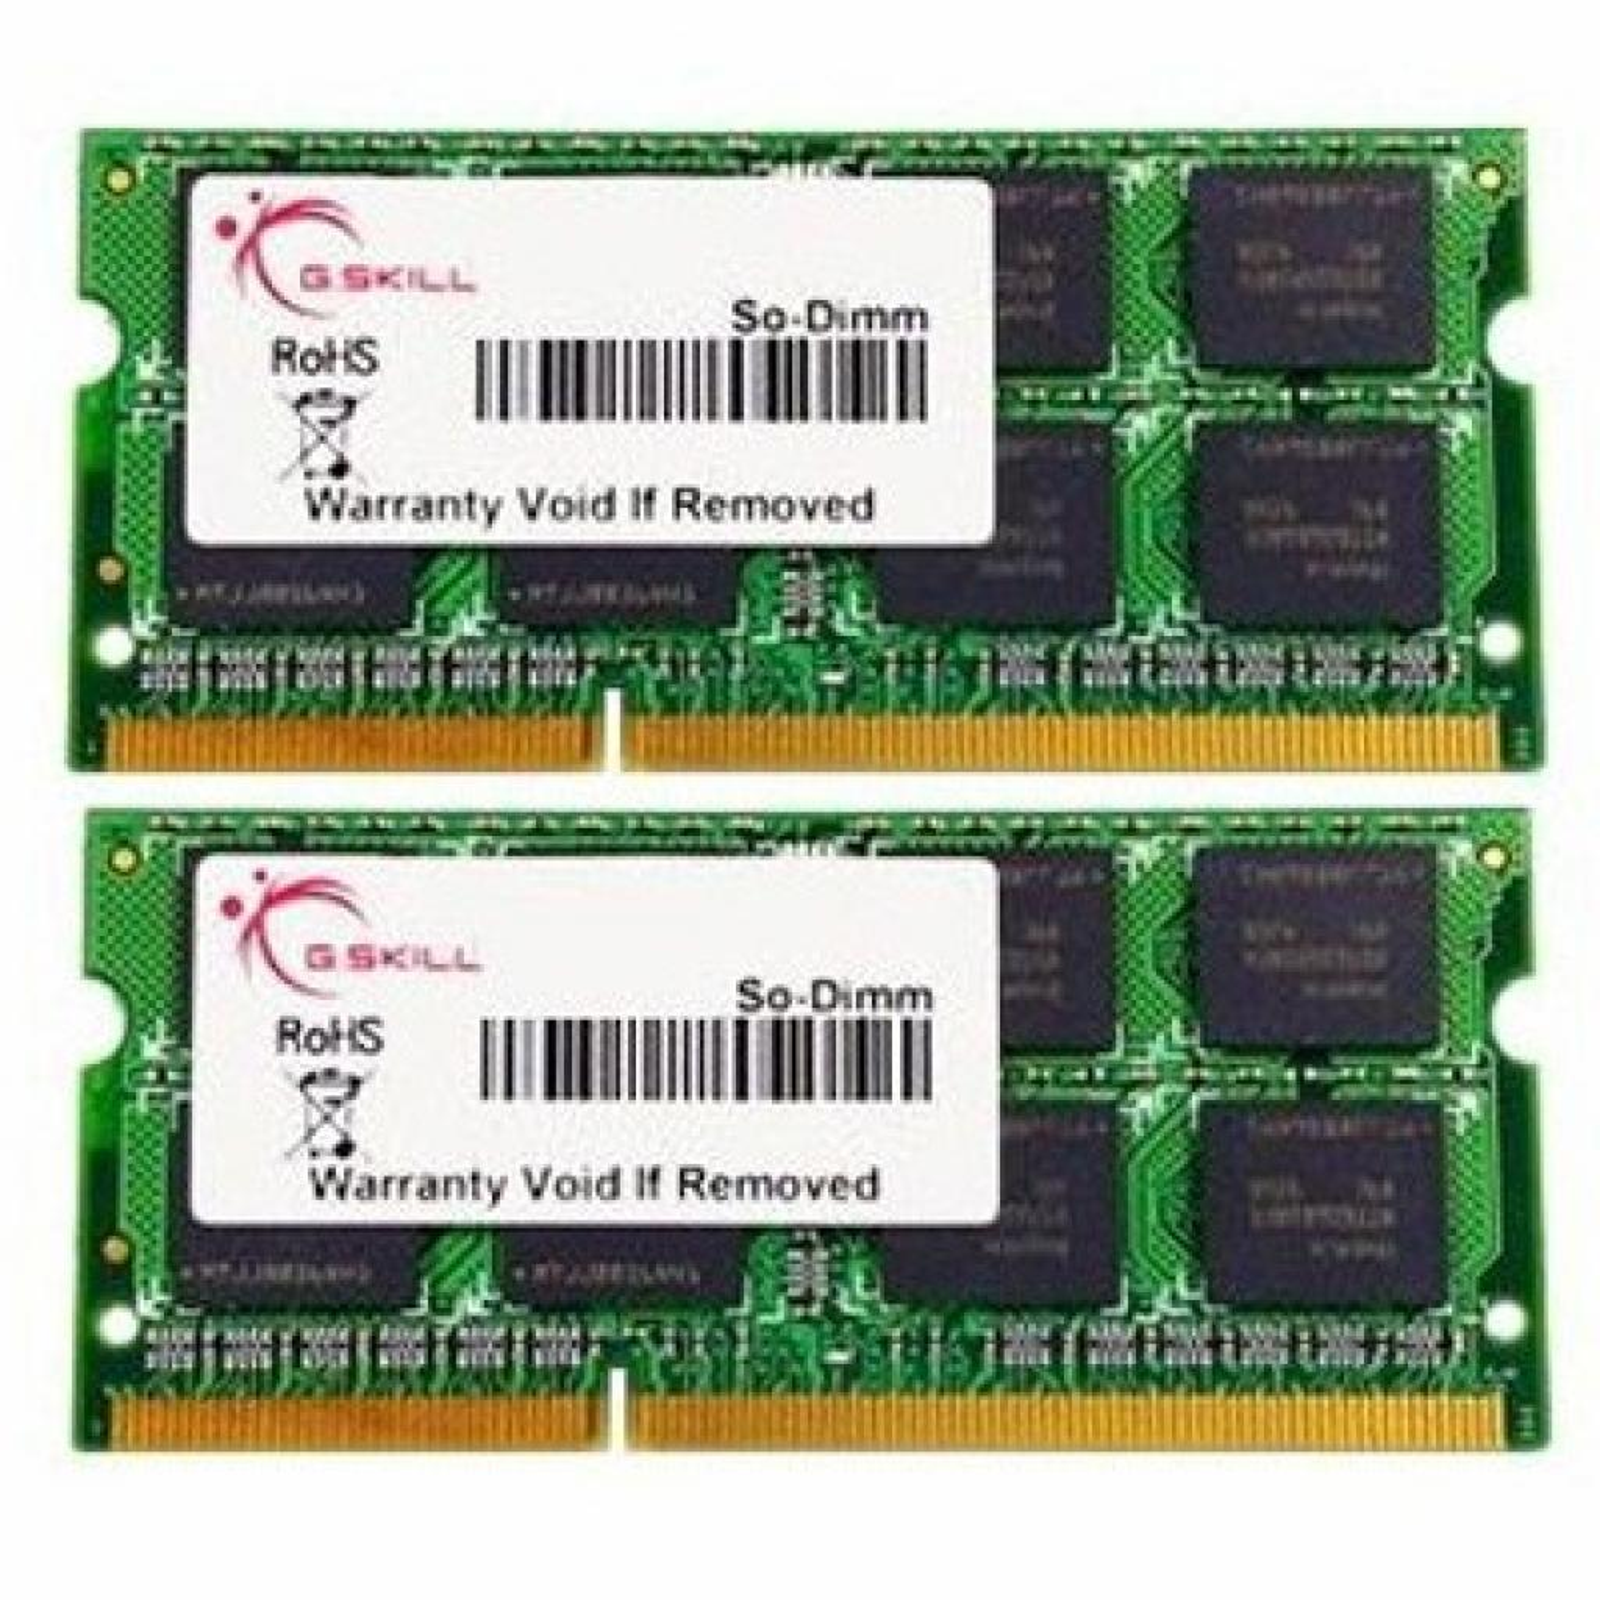 Модуль памяти для ноутбука SoDIMM DDR3 8GB (2x4GB) 1333 MHz G.Skill (F3-10666CL9D-8GBSQ)